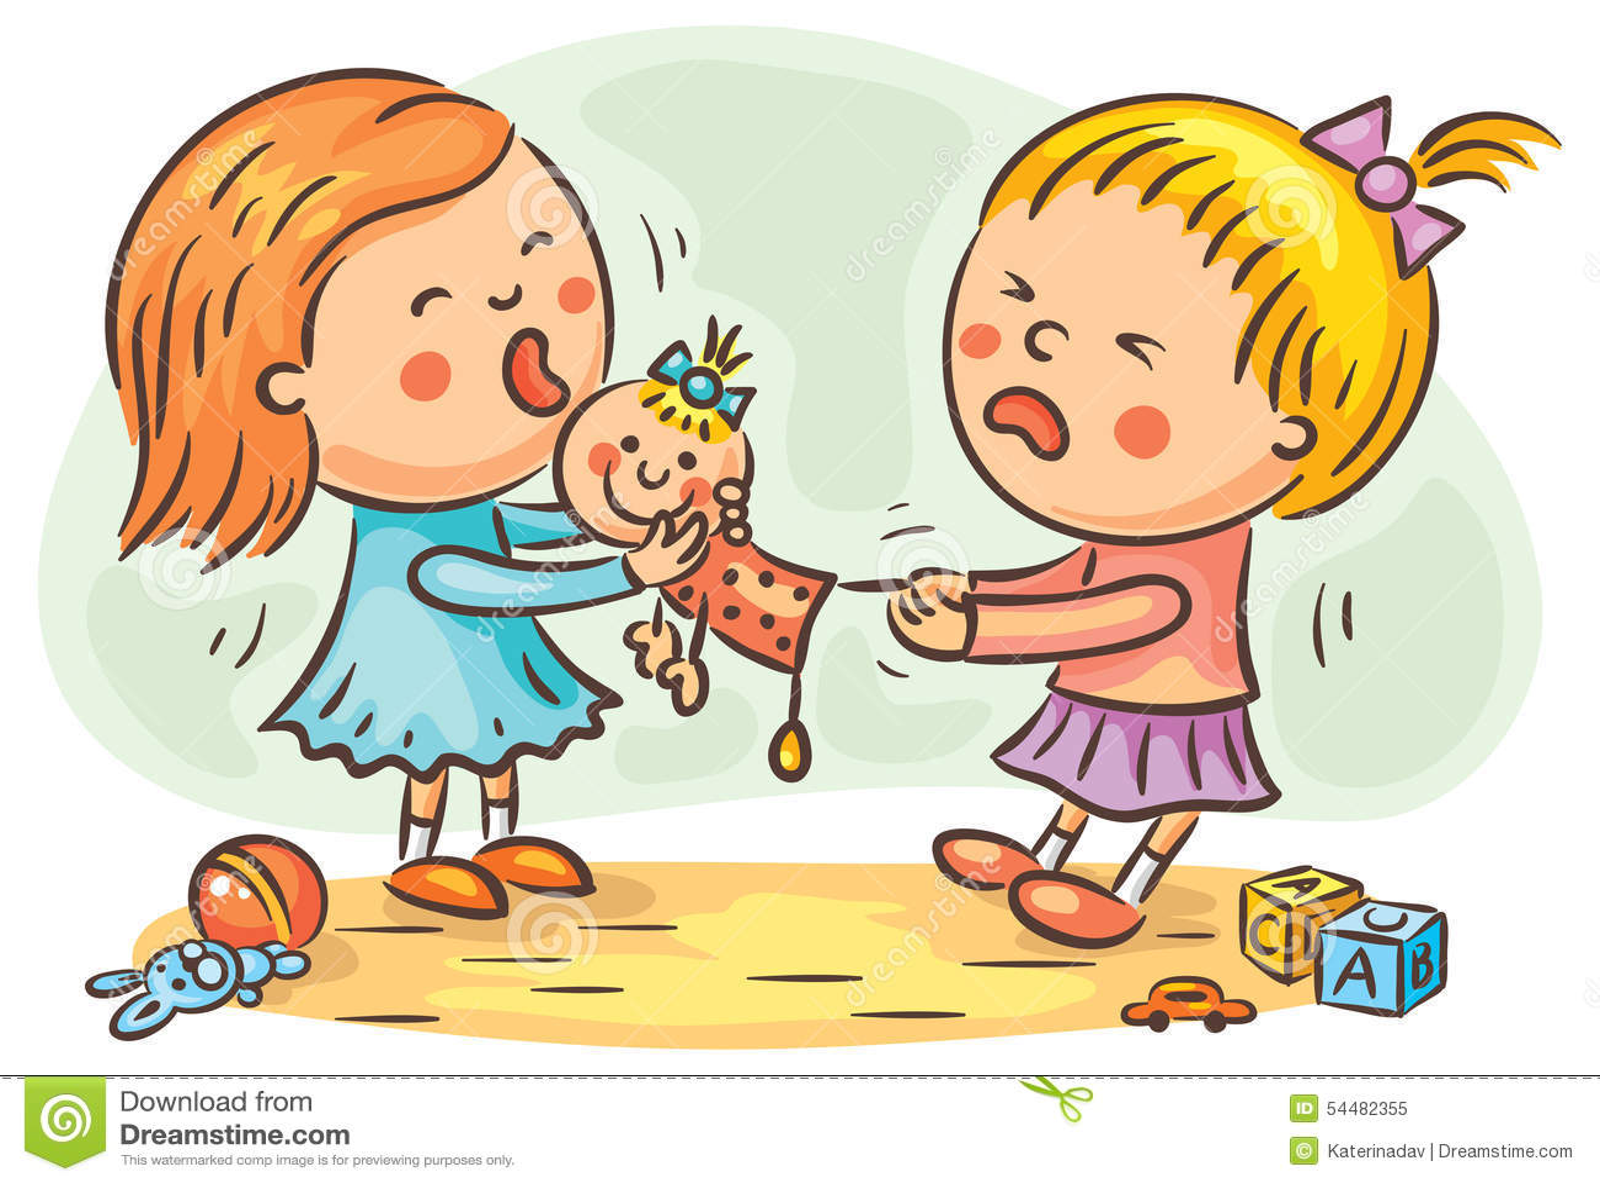 two girls fighting stock illustration. illustration of cartoon